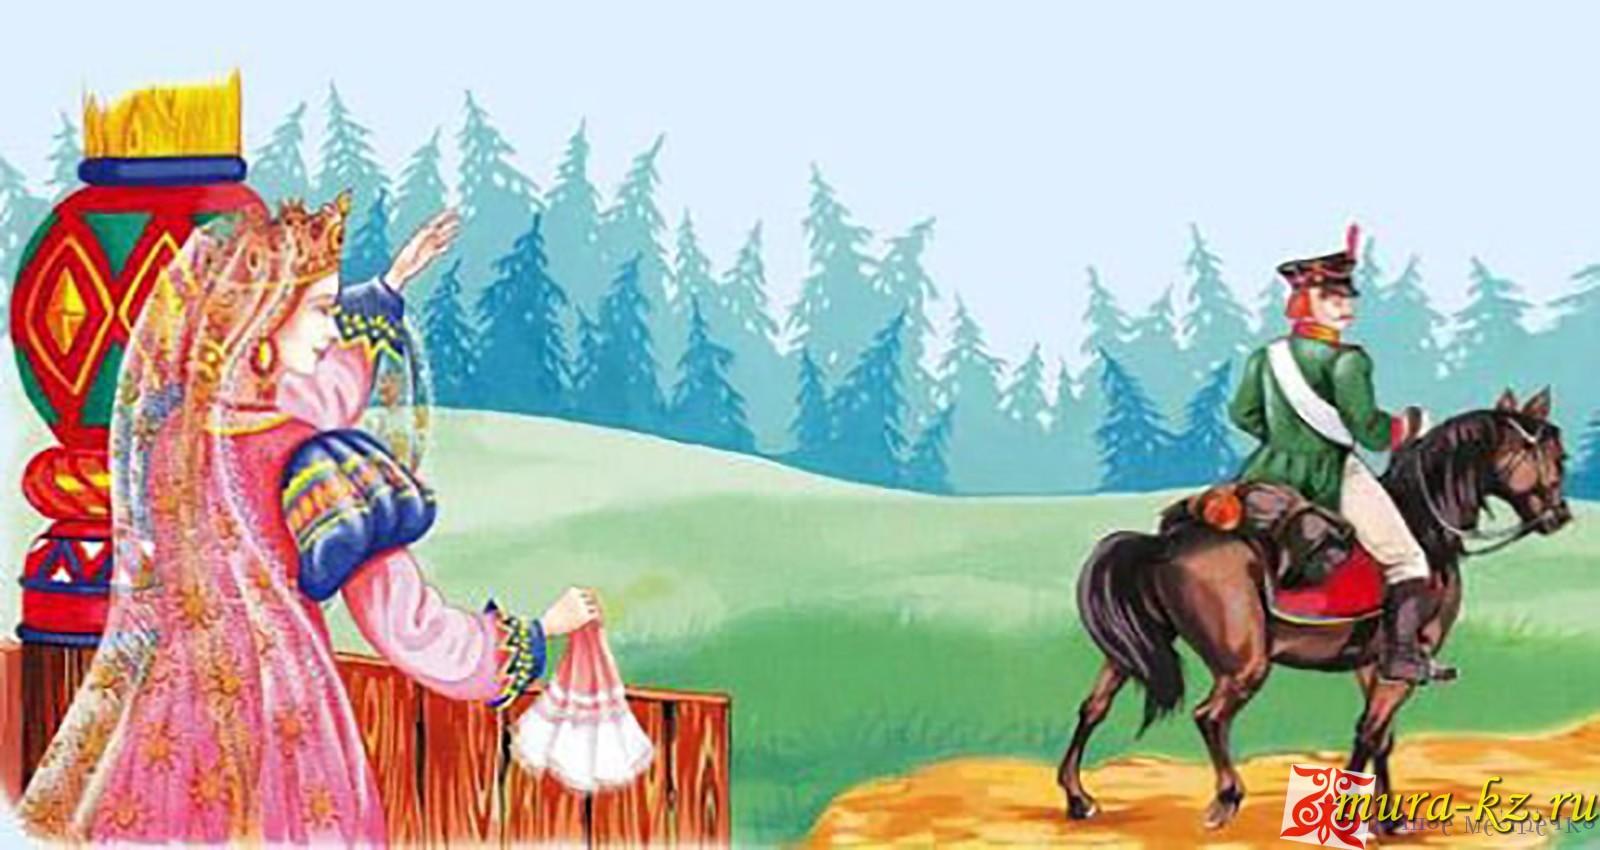 Сиқырланған ханша – Заколдованная королевна